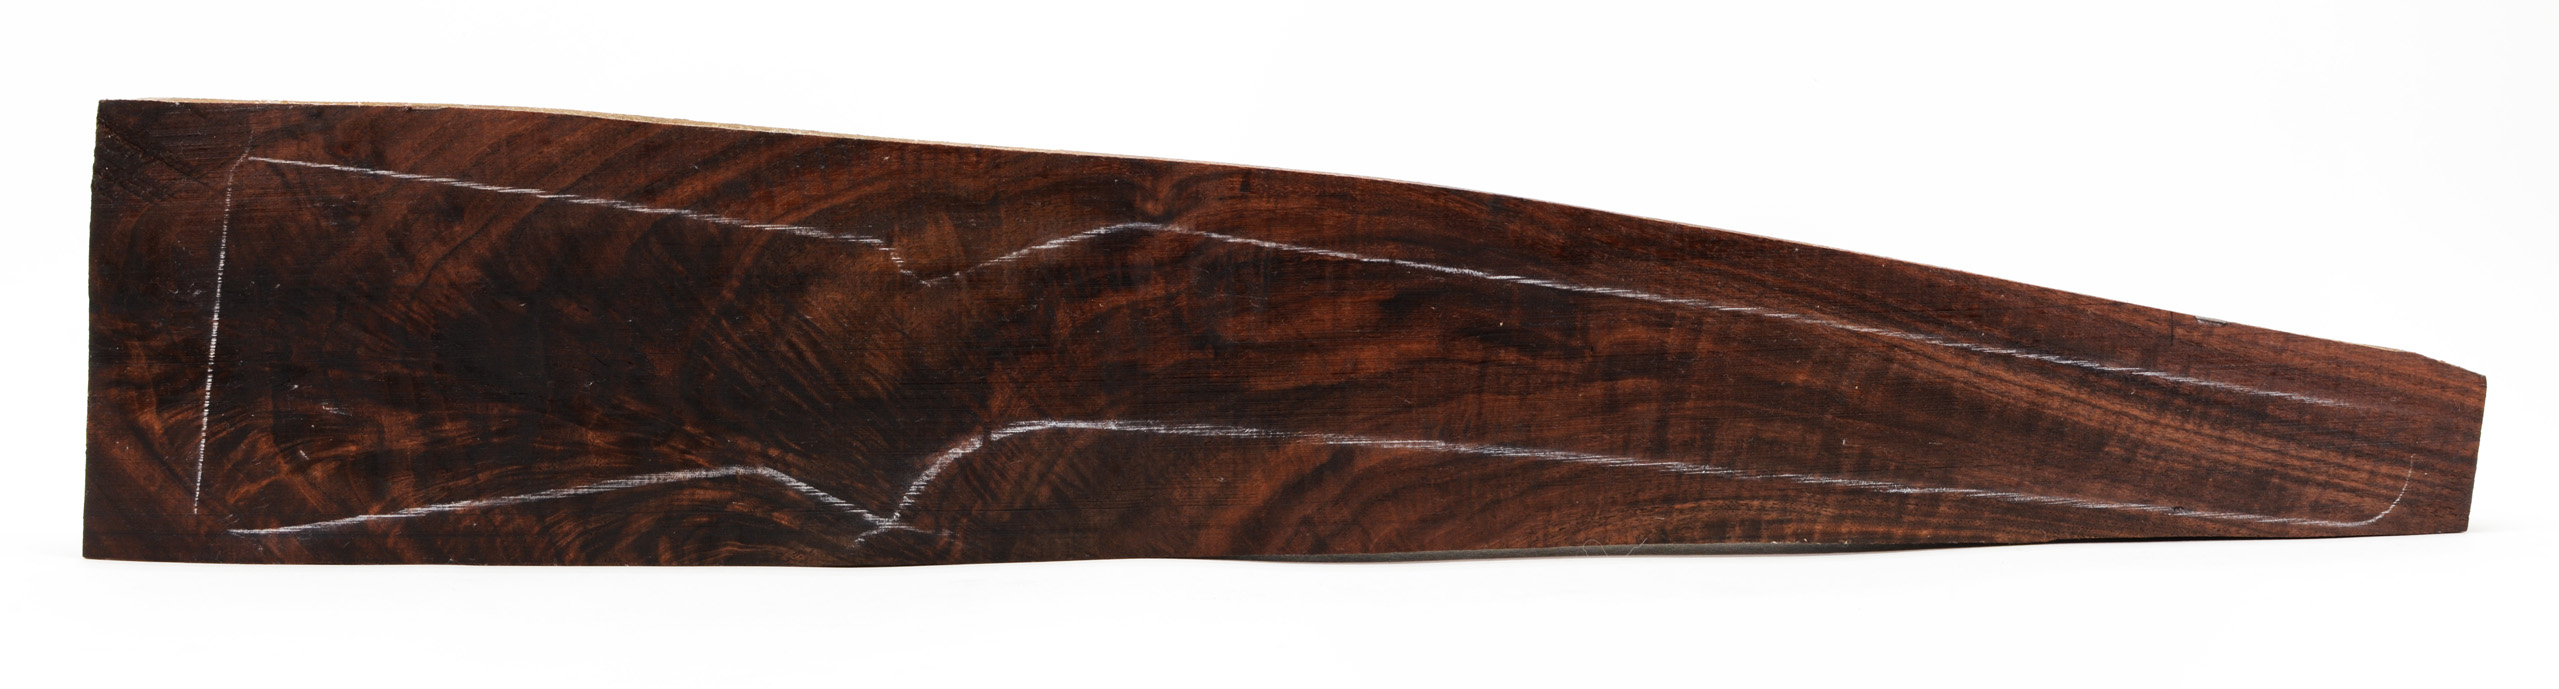 Wood Gun Stock Blank